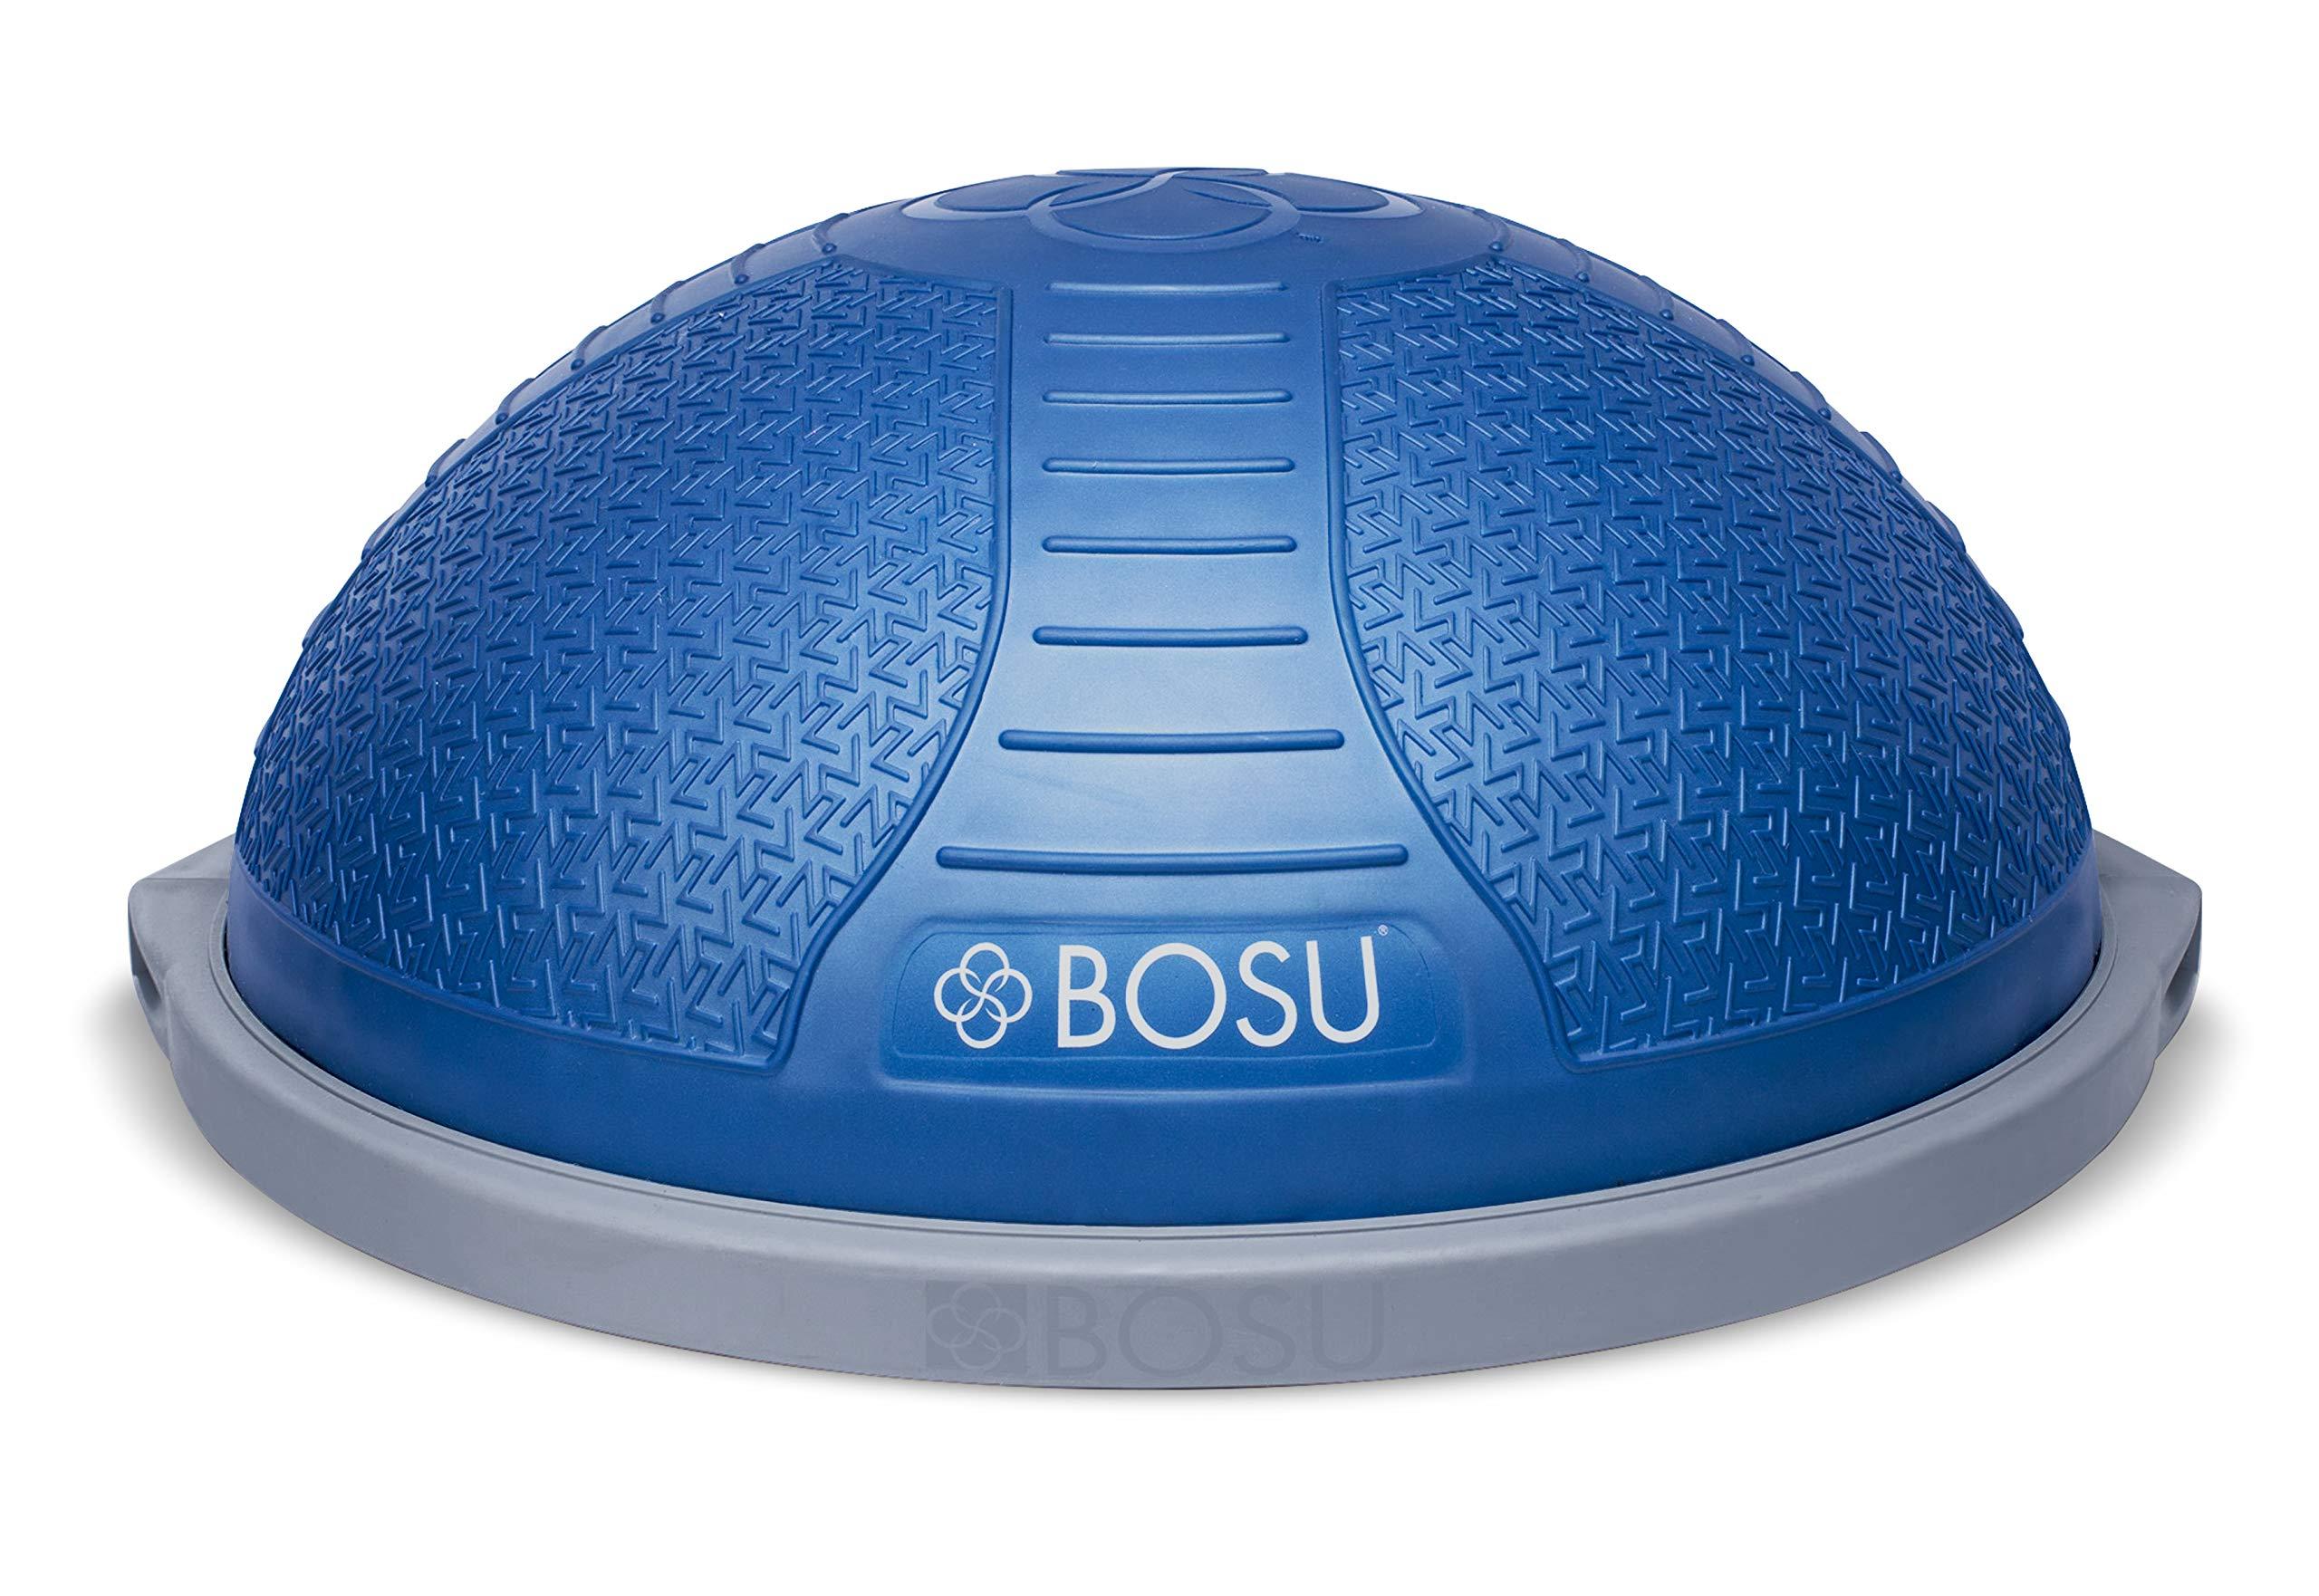 Bosu Pro NexGen 65CM Balance Trainer by Bosu (Image #1)